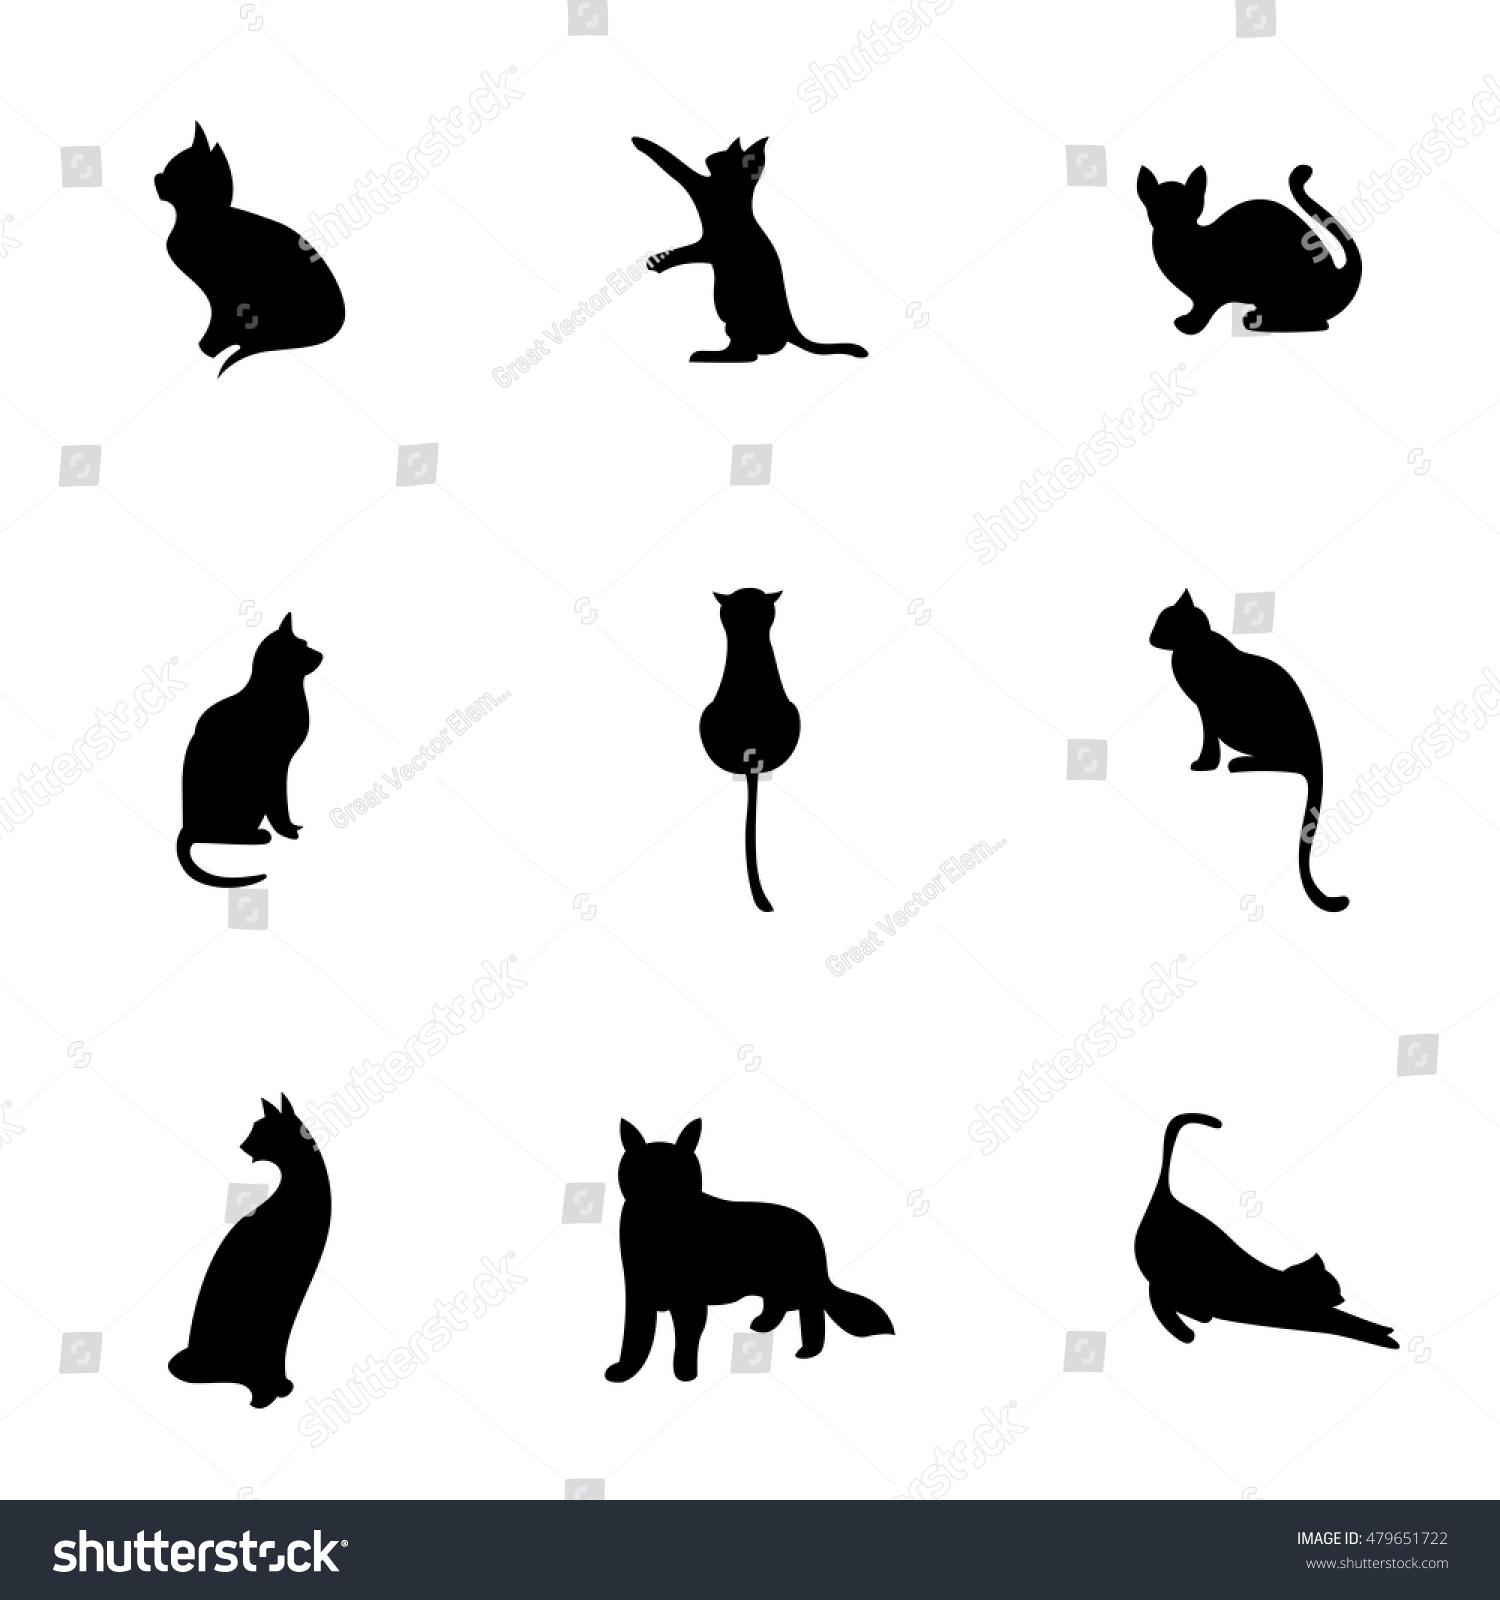 cat vector simple cat illustration editable stock vector 479651722